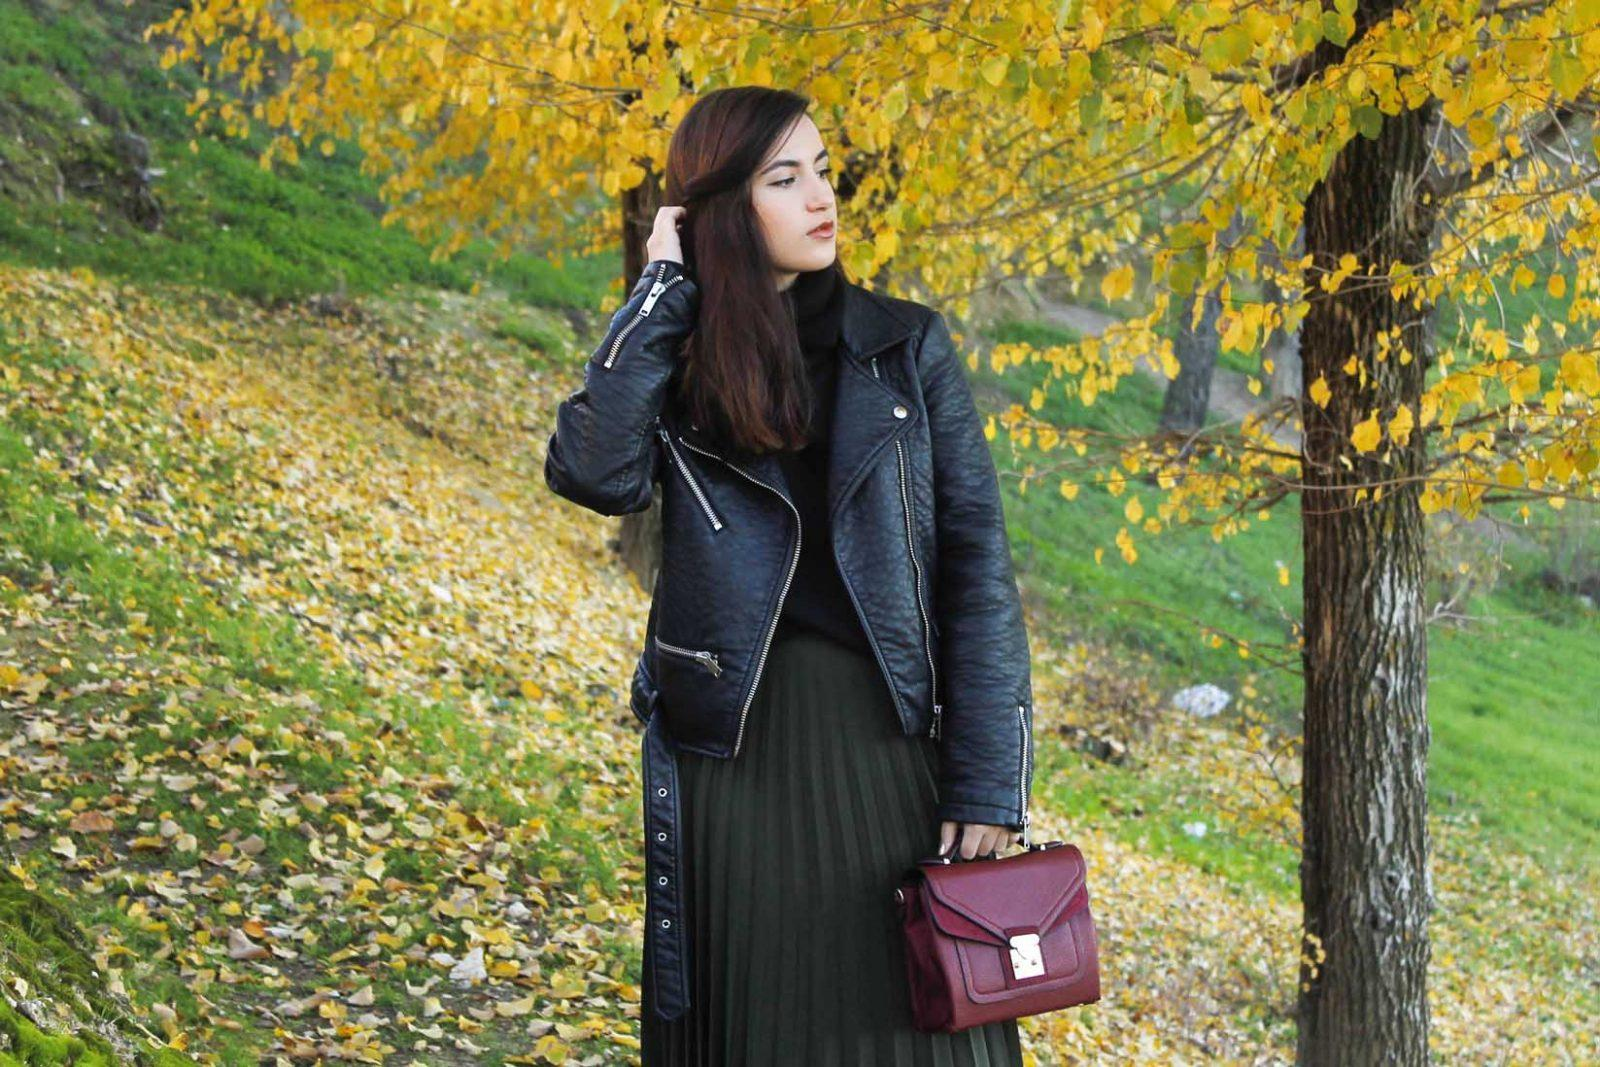 marikowskaya-street-style-deire-falda-plisada-negra-1